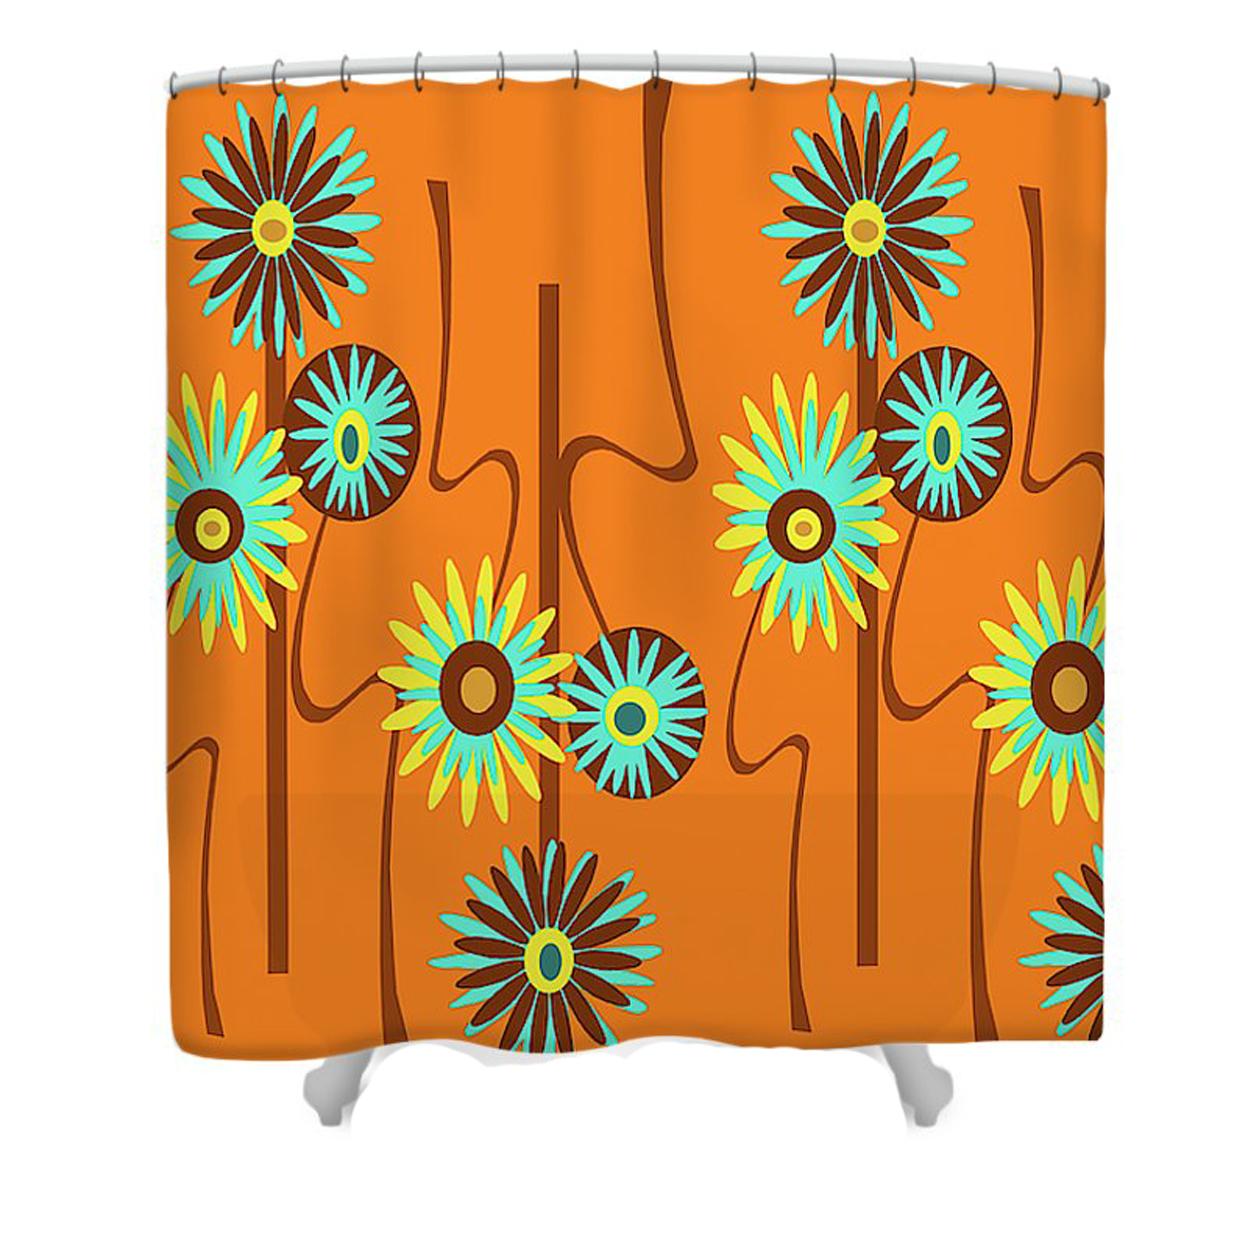 Shower Curtain - Crash Pad Designs Alatair